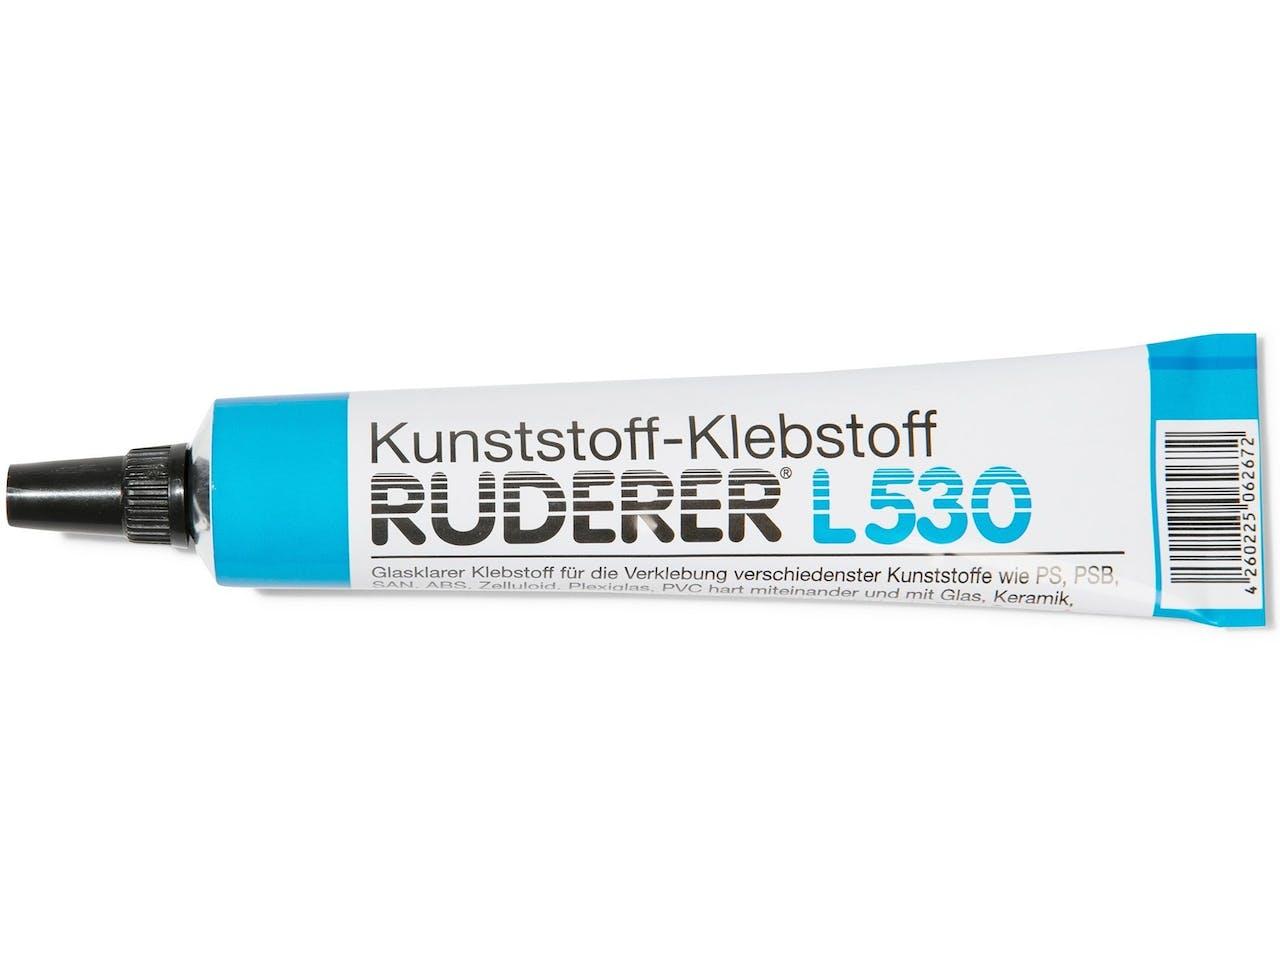 Kunststoff-Kleber, Ruderer L530, Tube 20 g